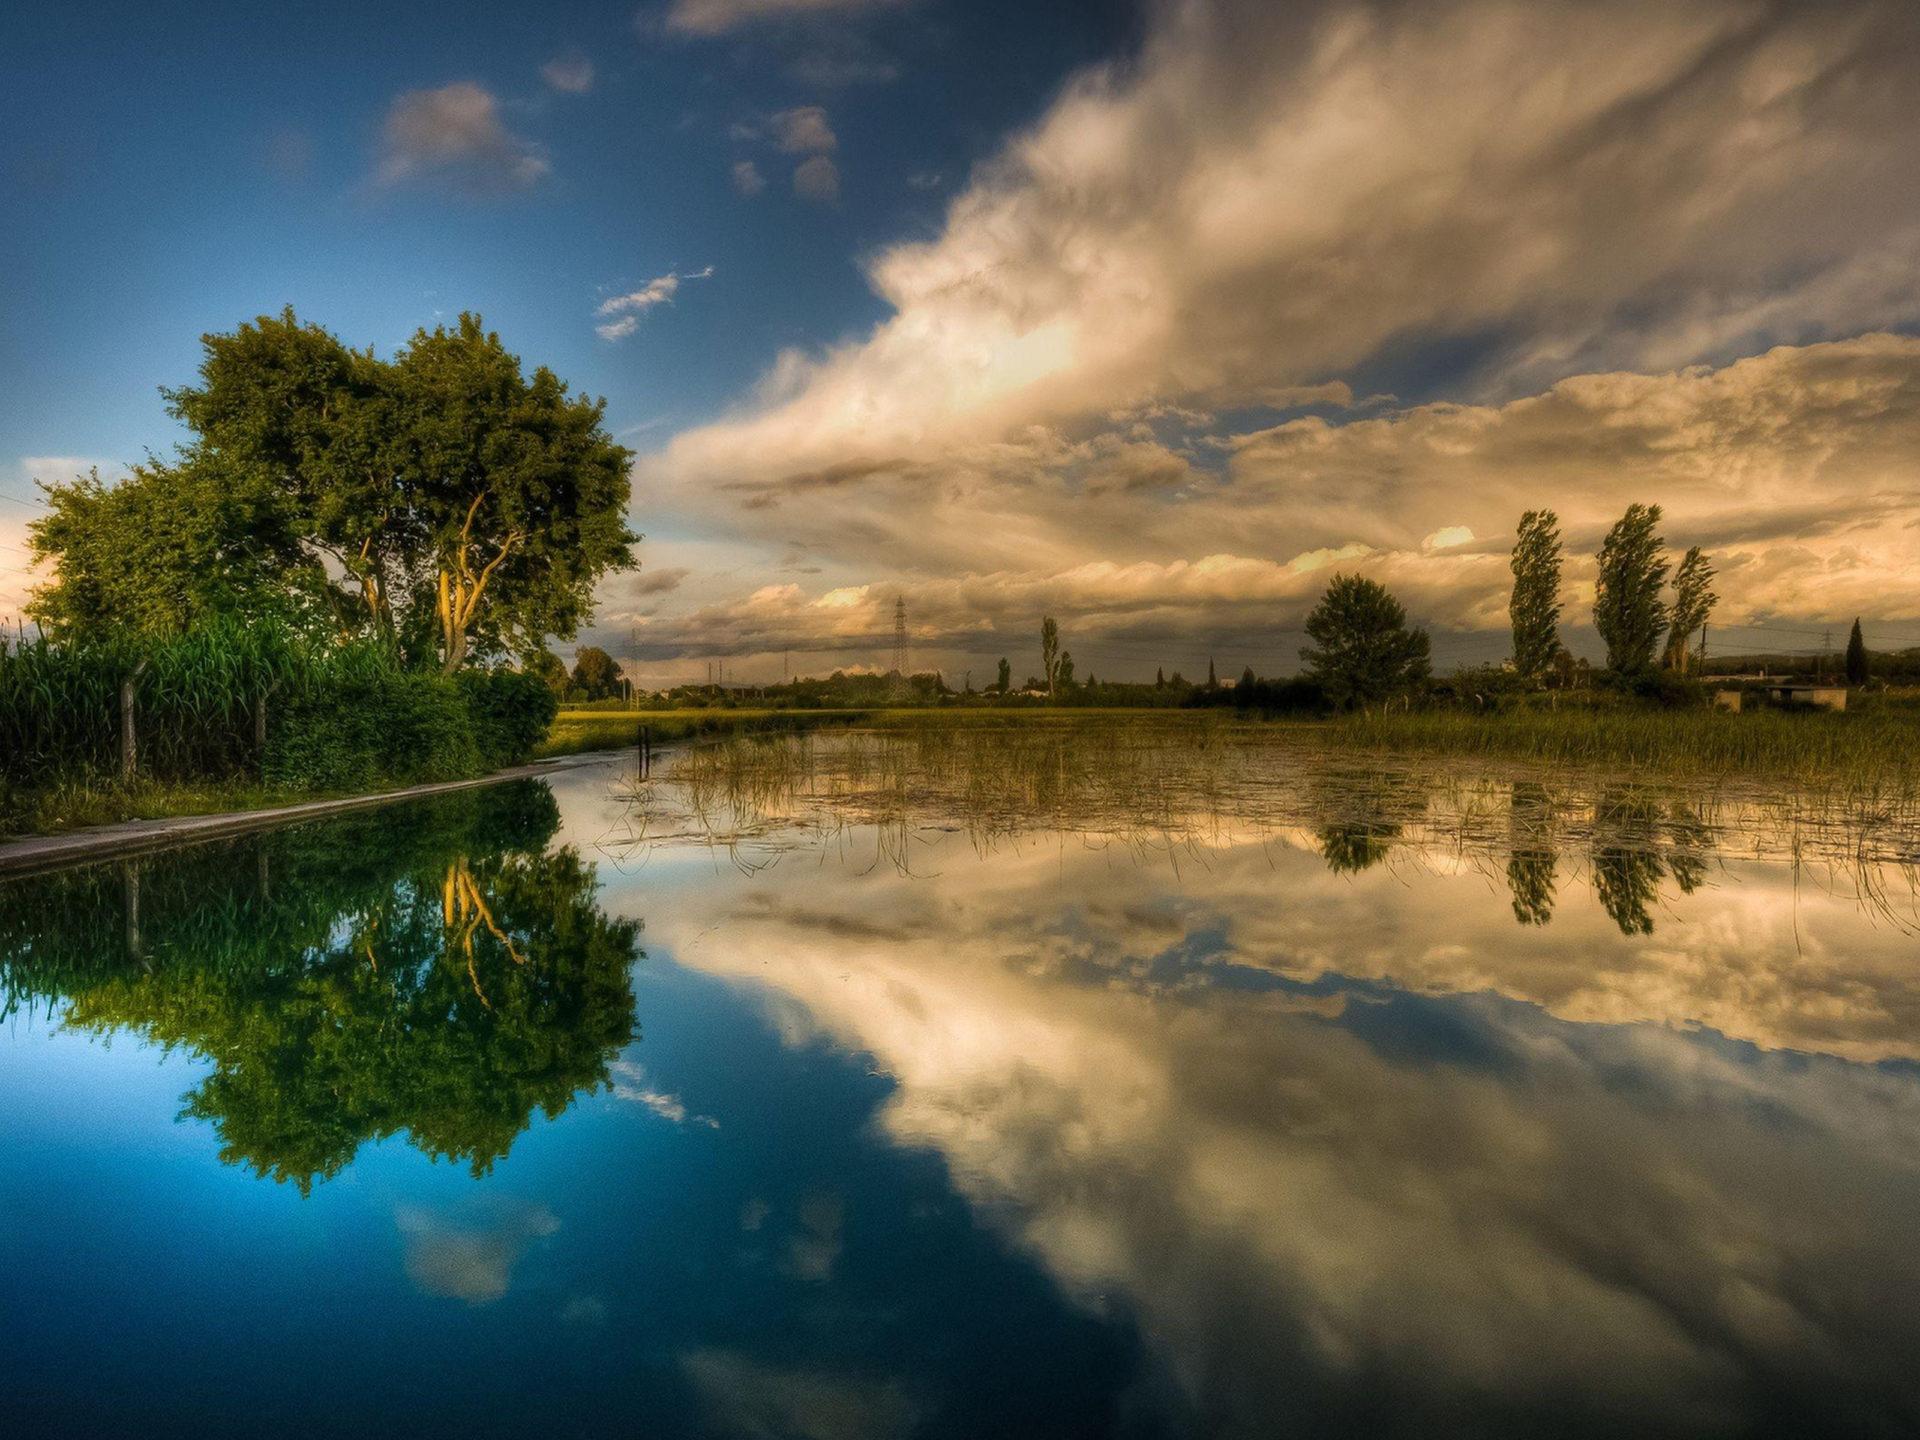 Hd Cars Wallpaper Iphone Background Lake Sky Reflecting Hd Wallpaper 15903